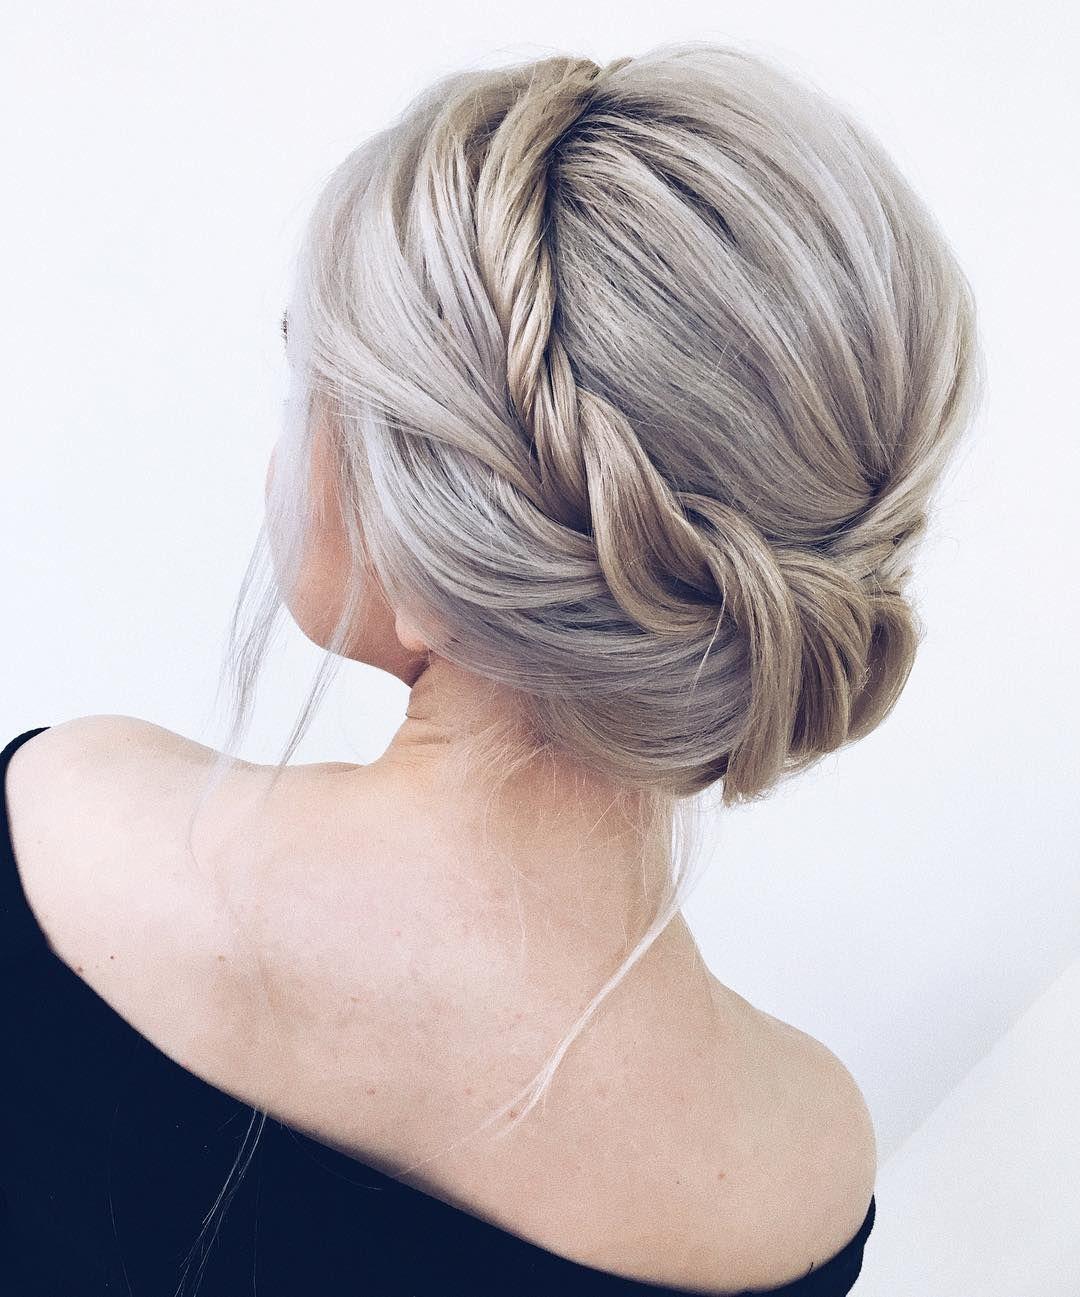 Romantic wedding hairstyles to inspire you updo high bun